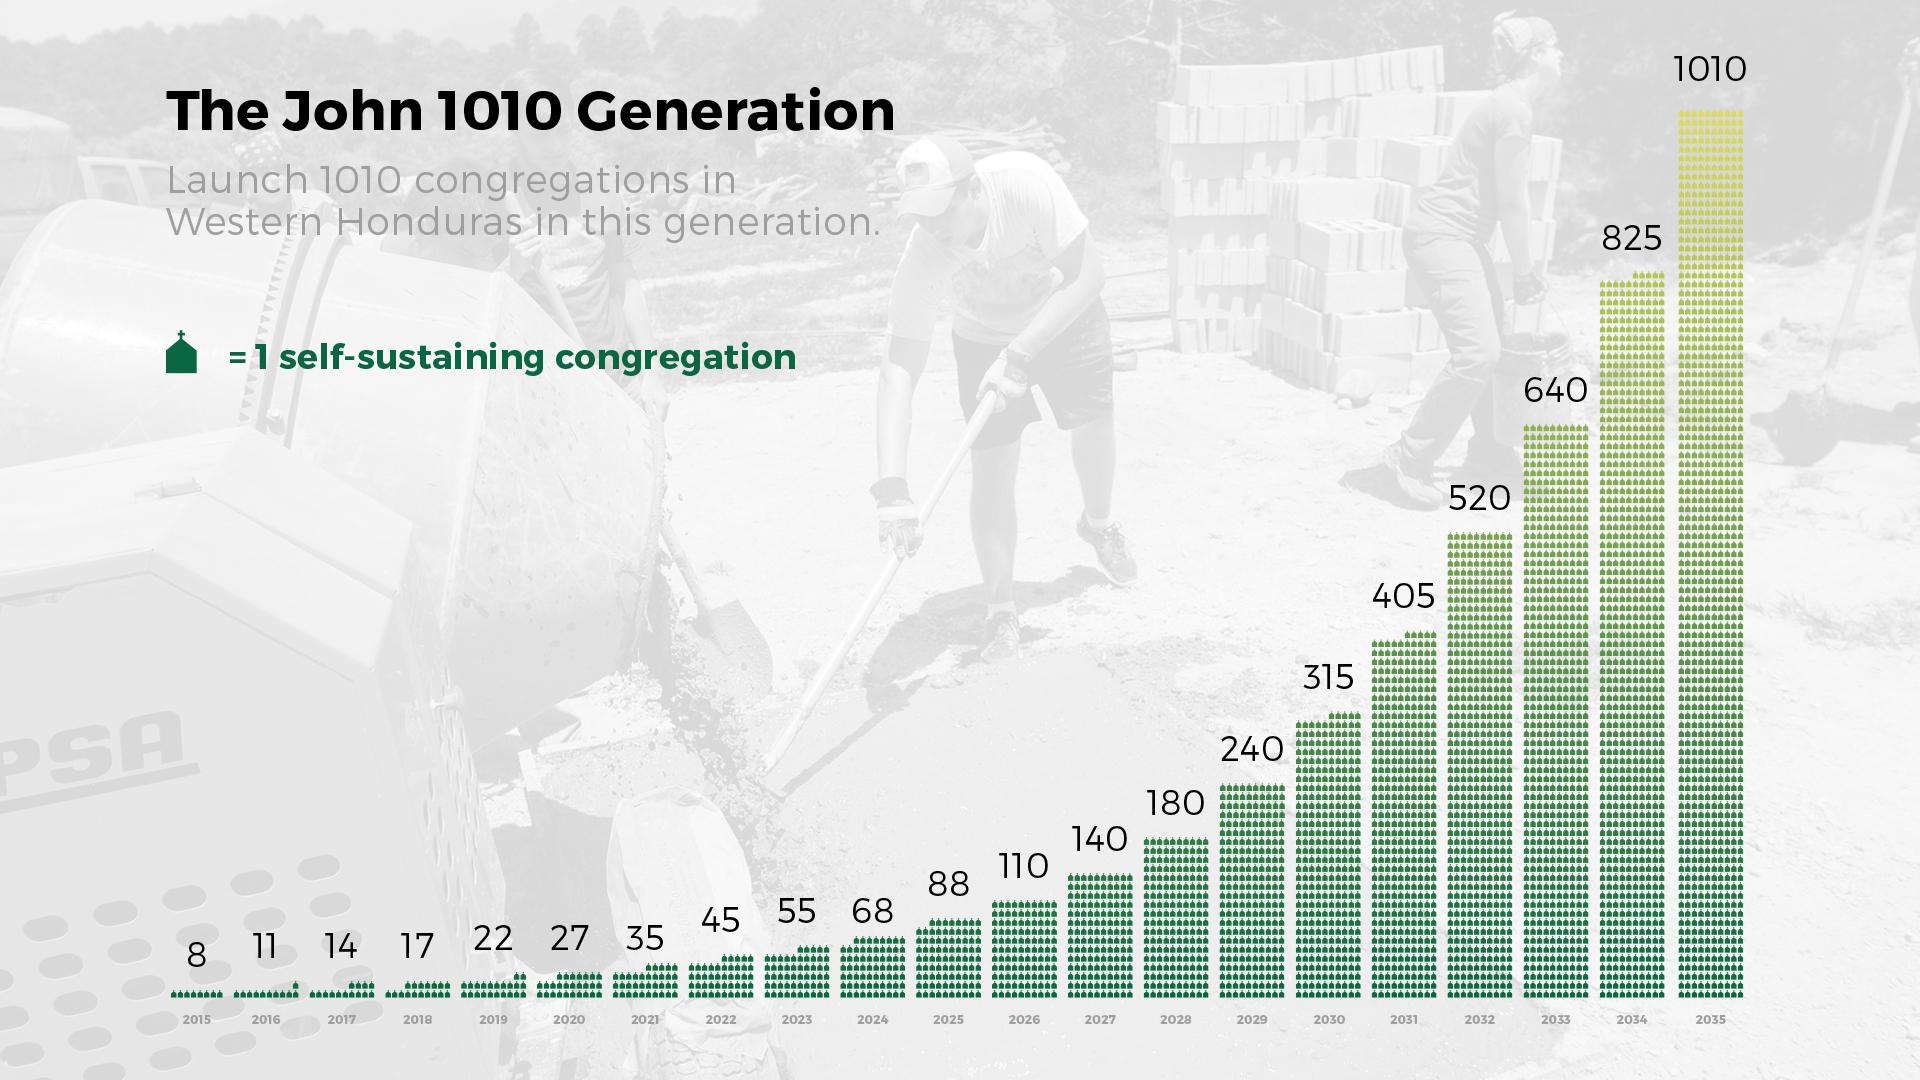 John 1010 Generation